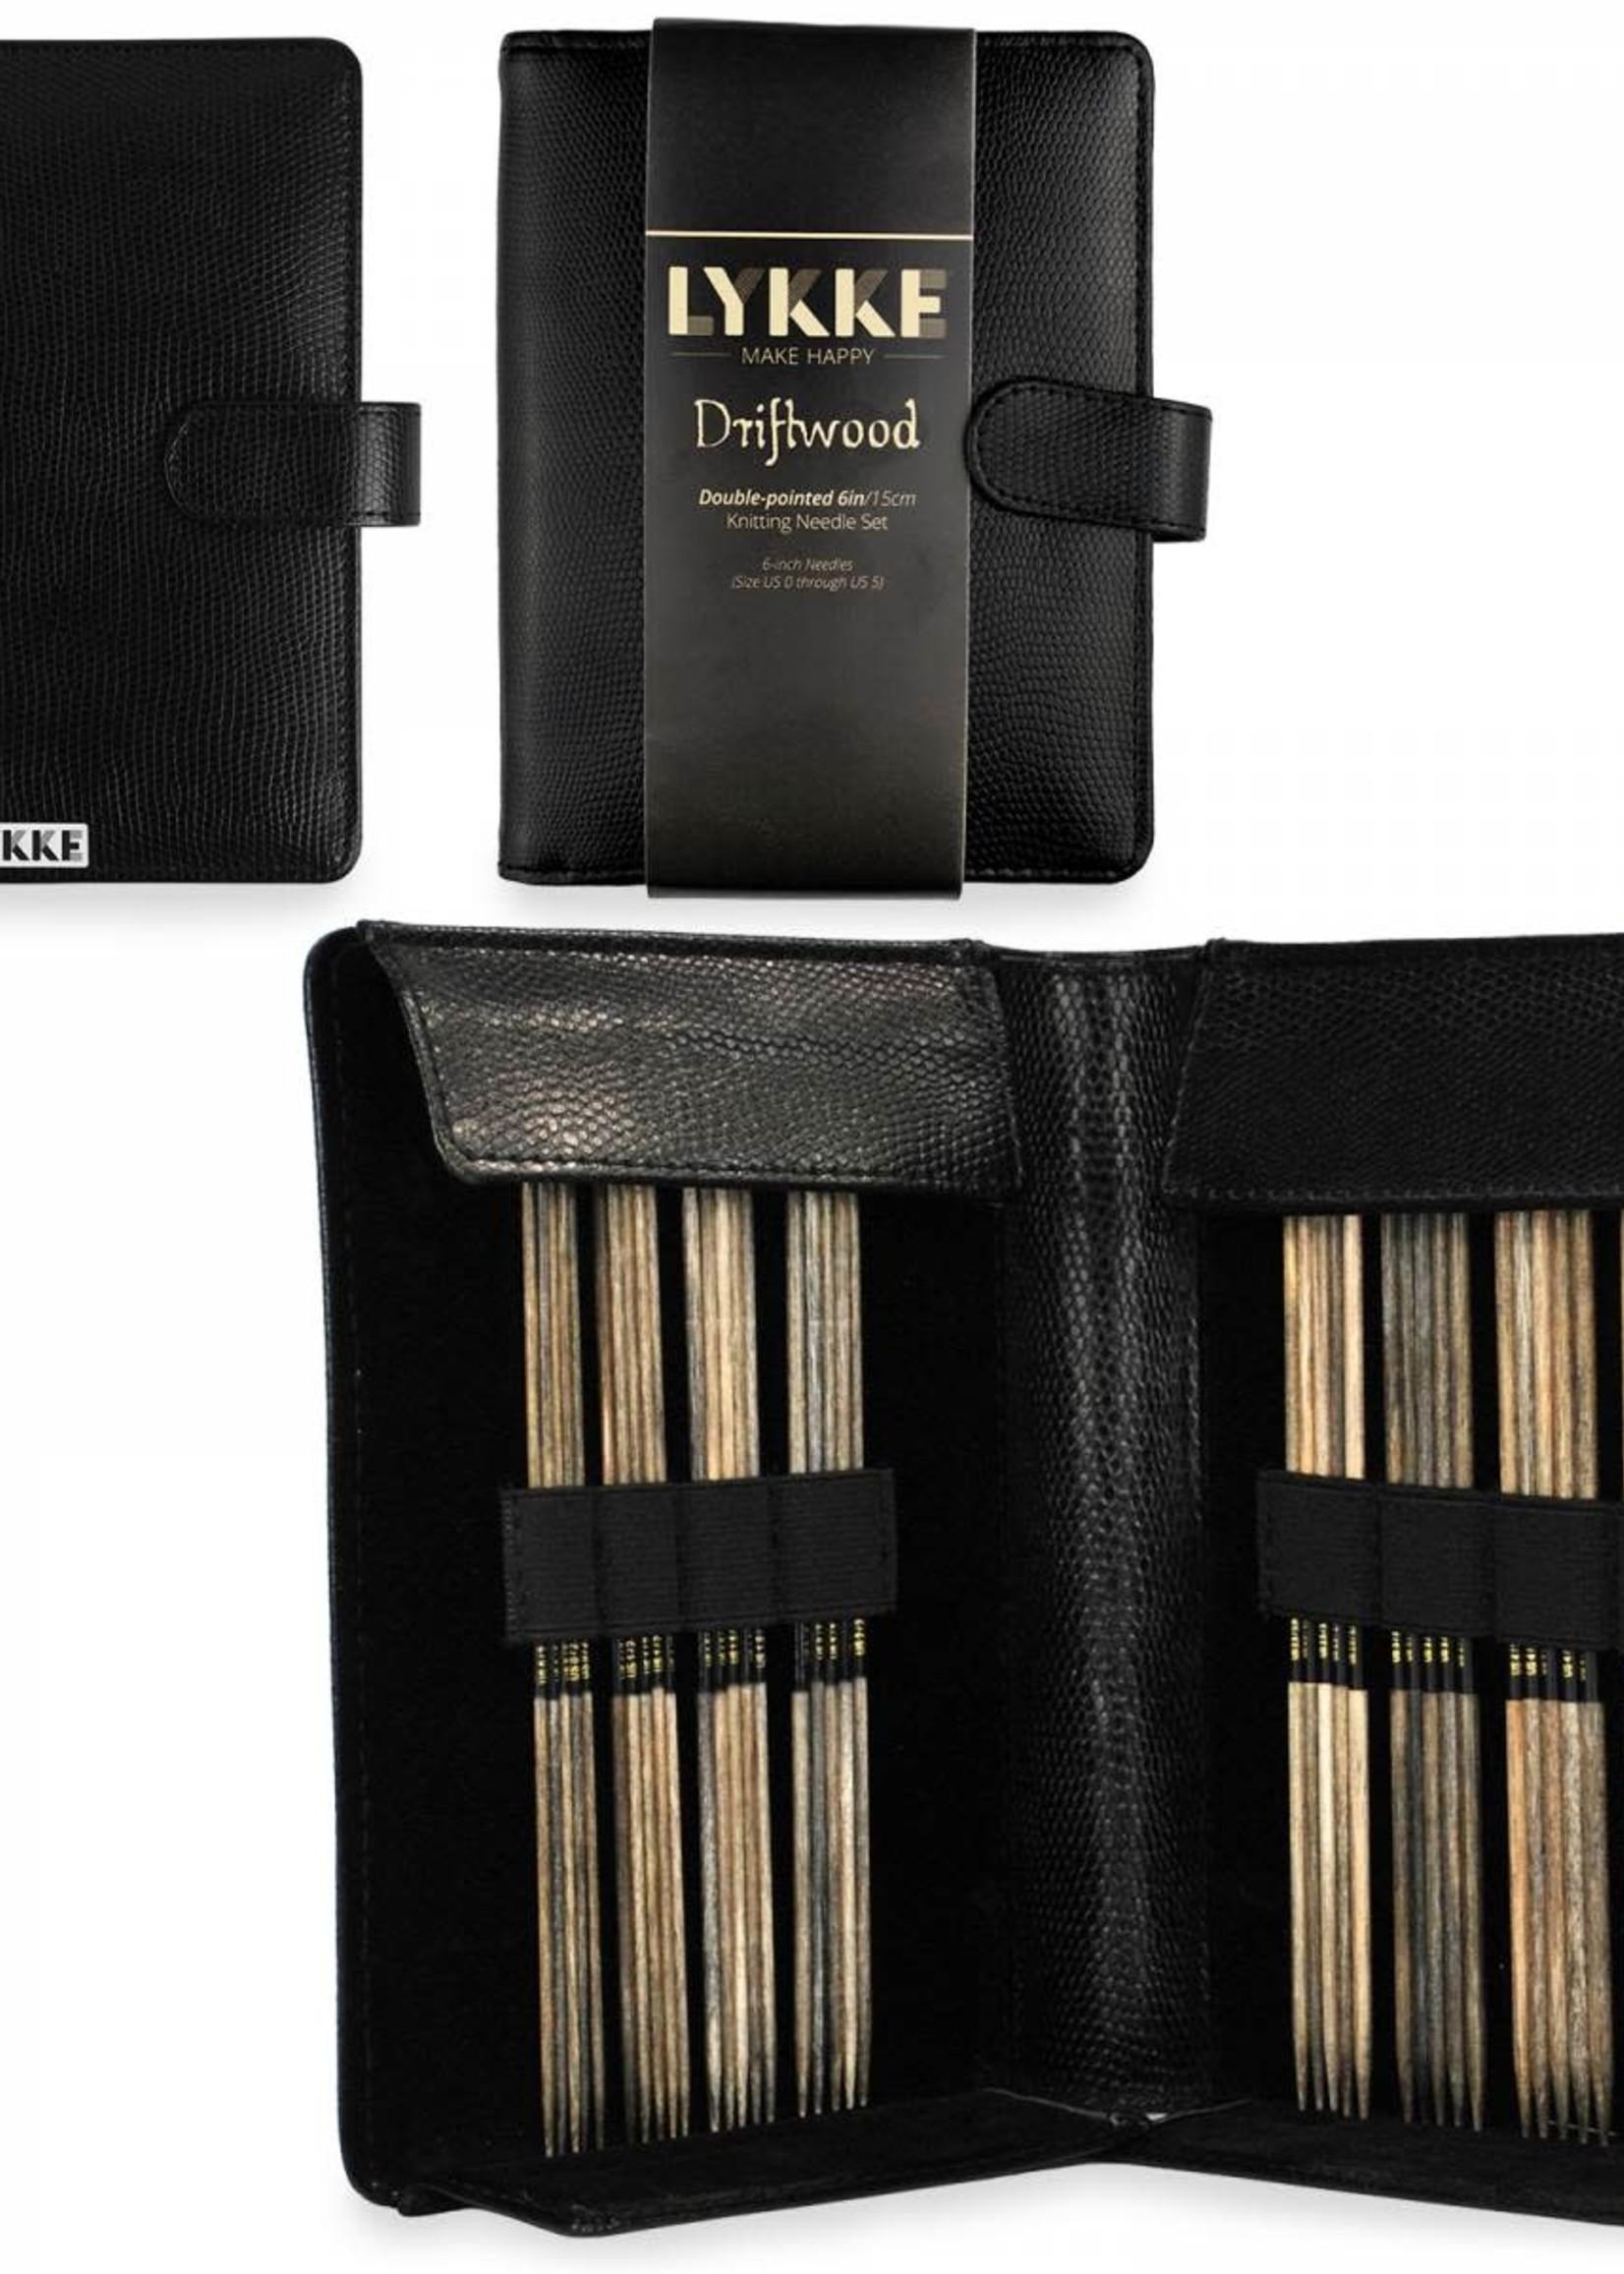 "Lykke Needles Lykke Double Pointed Set - 6"" Driftwood Small - Black Faux Leather Case"